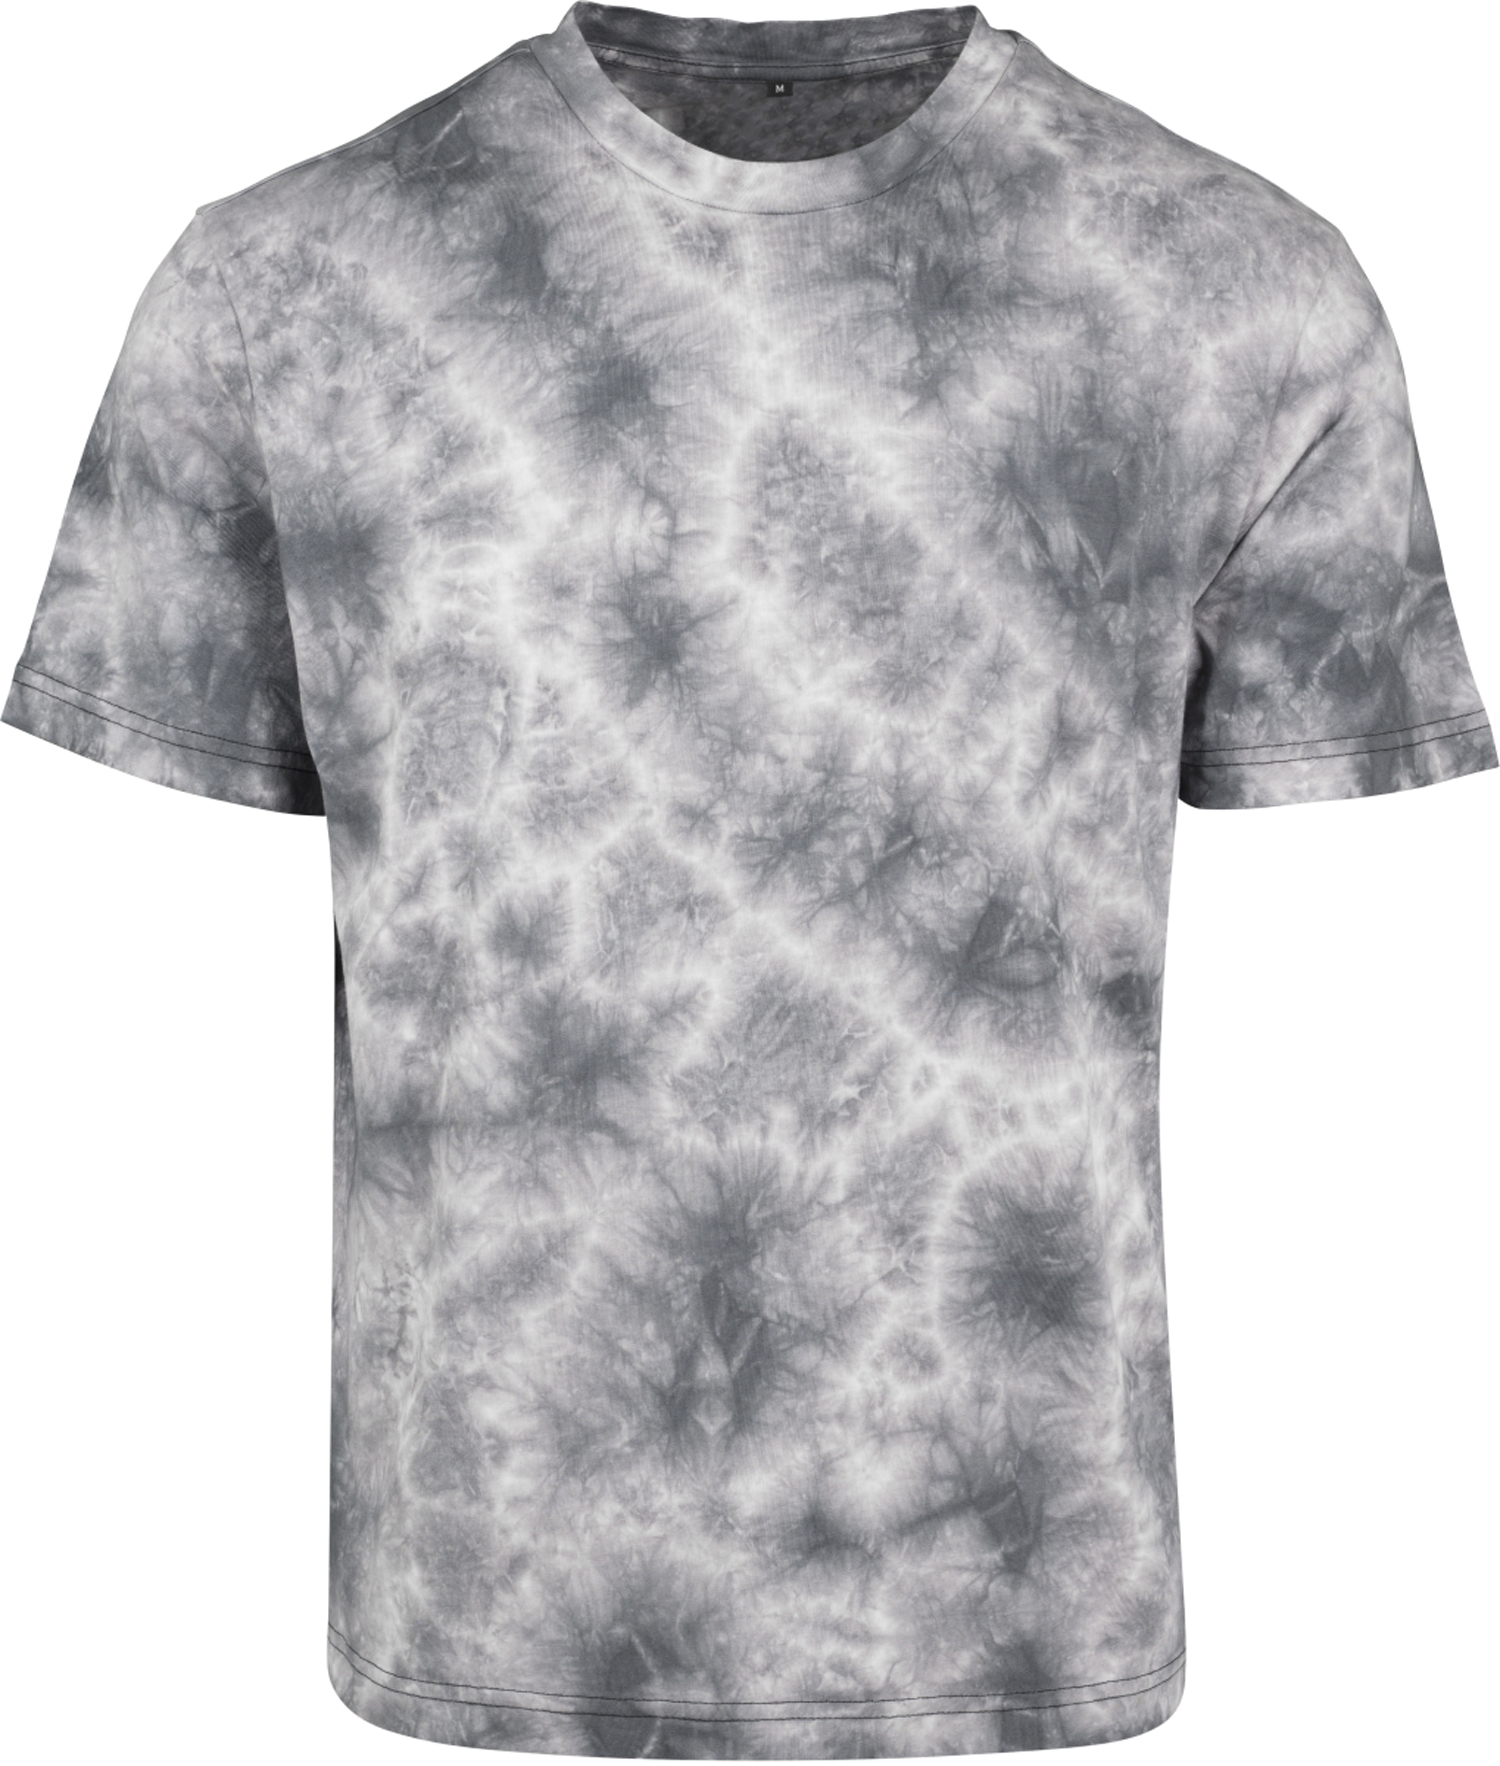 Gut bekannt T-Shirt Sofasurfer® Batik Dye Tee T-shirt Herren Shirt | Fashion DU79